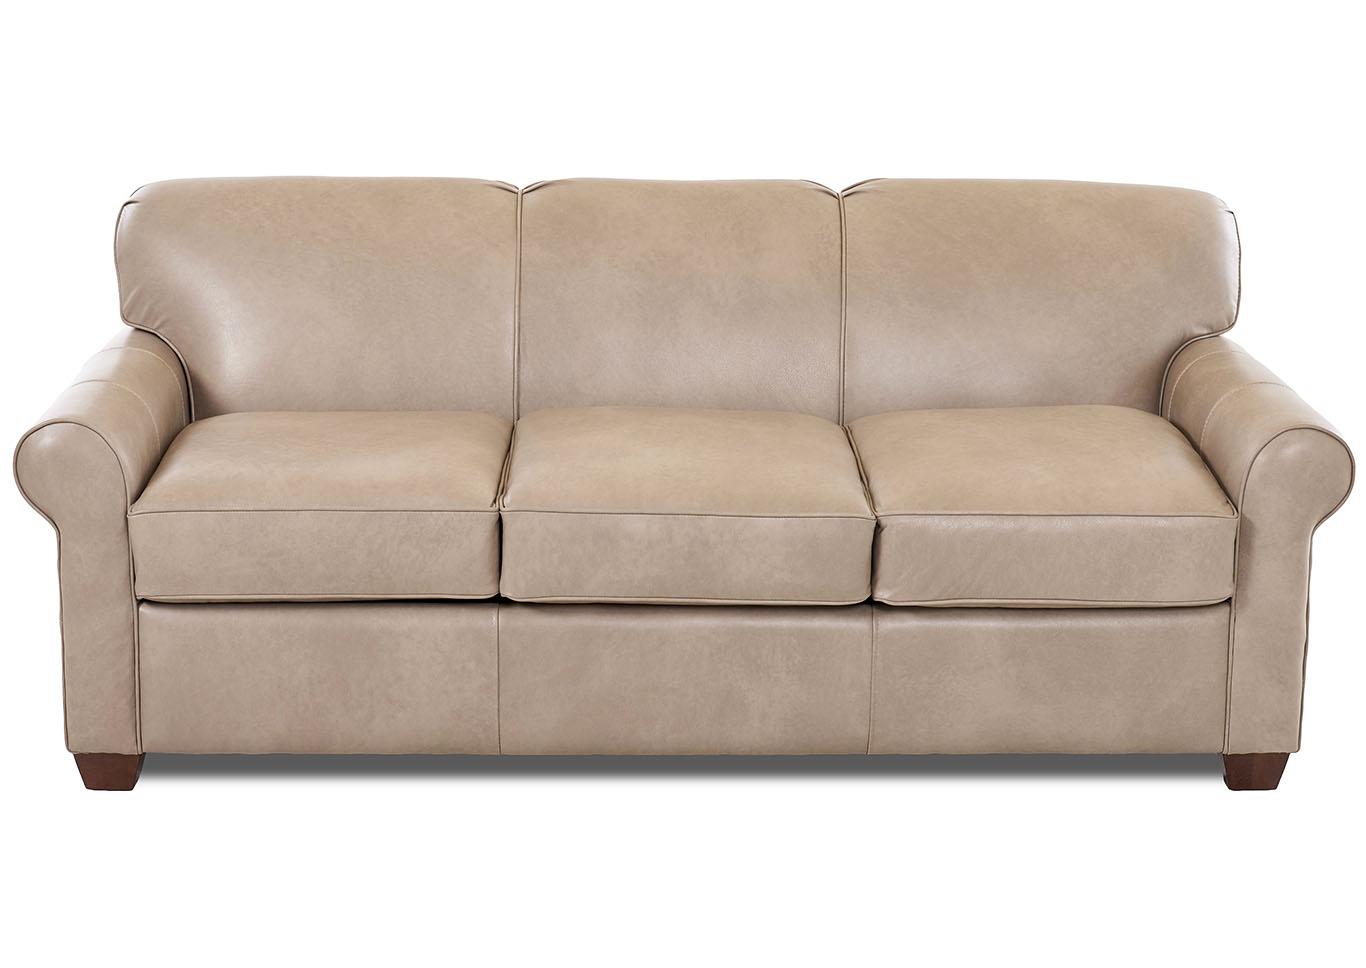 Sofas 2 Furnishings Mayhew Steamboat Putty Brown Leather Sleeper Sofa